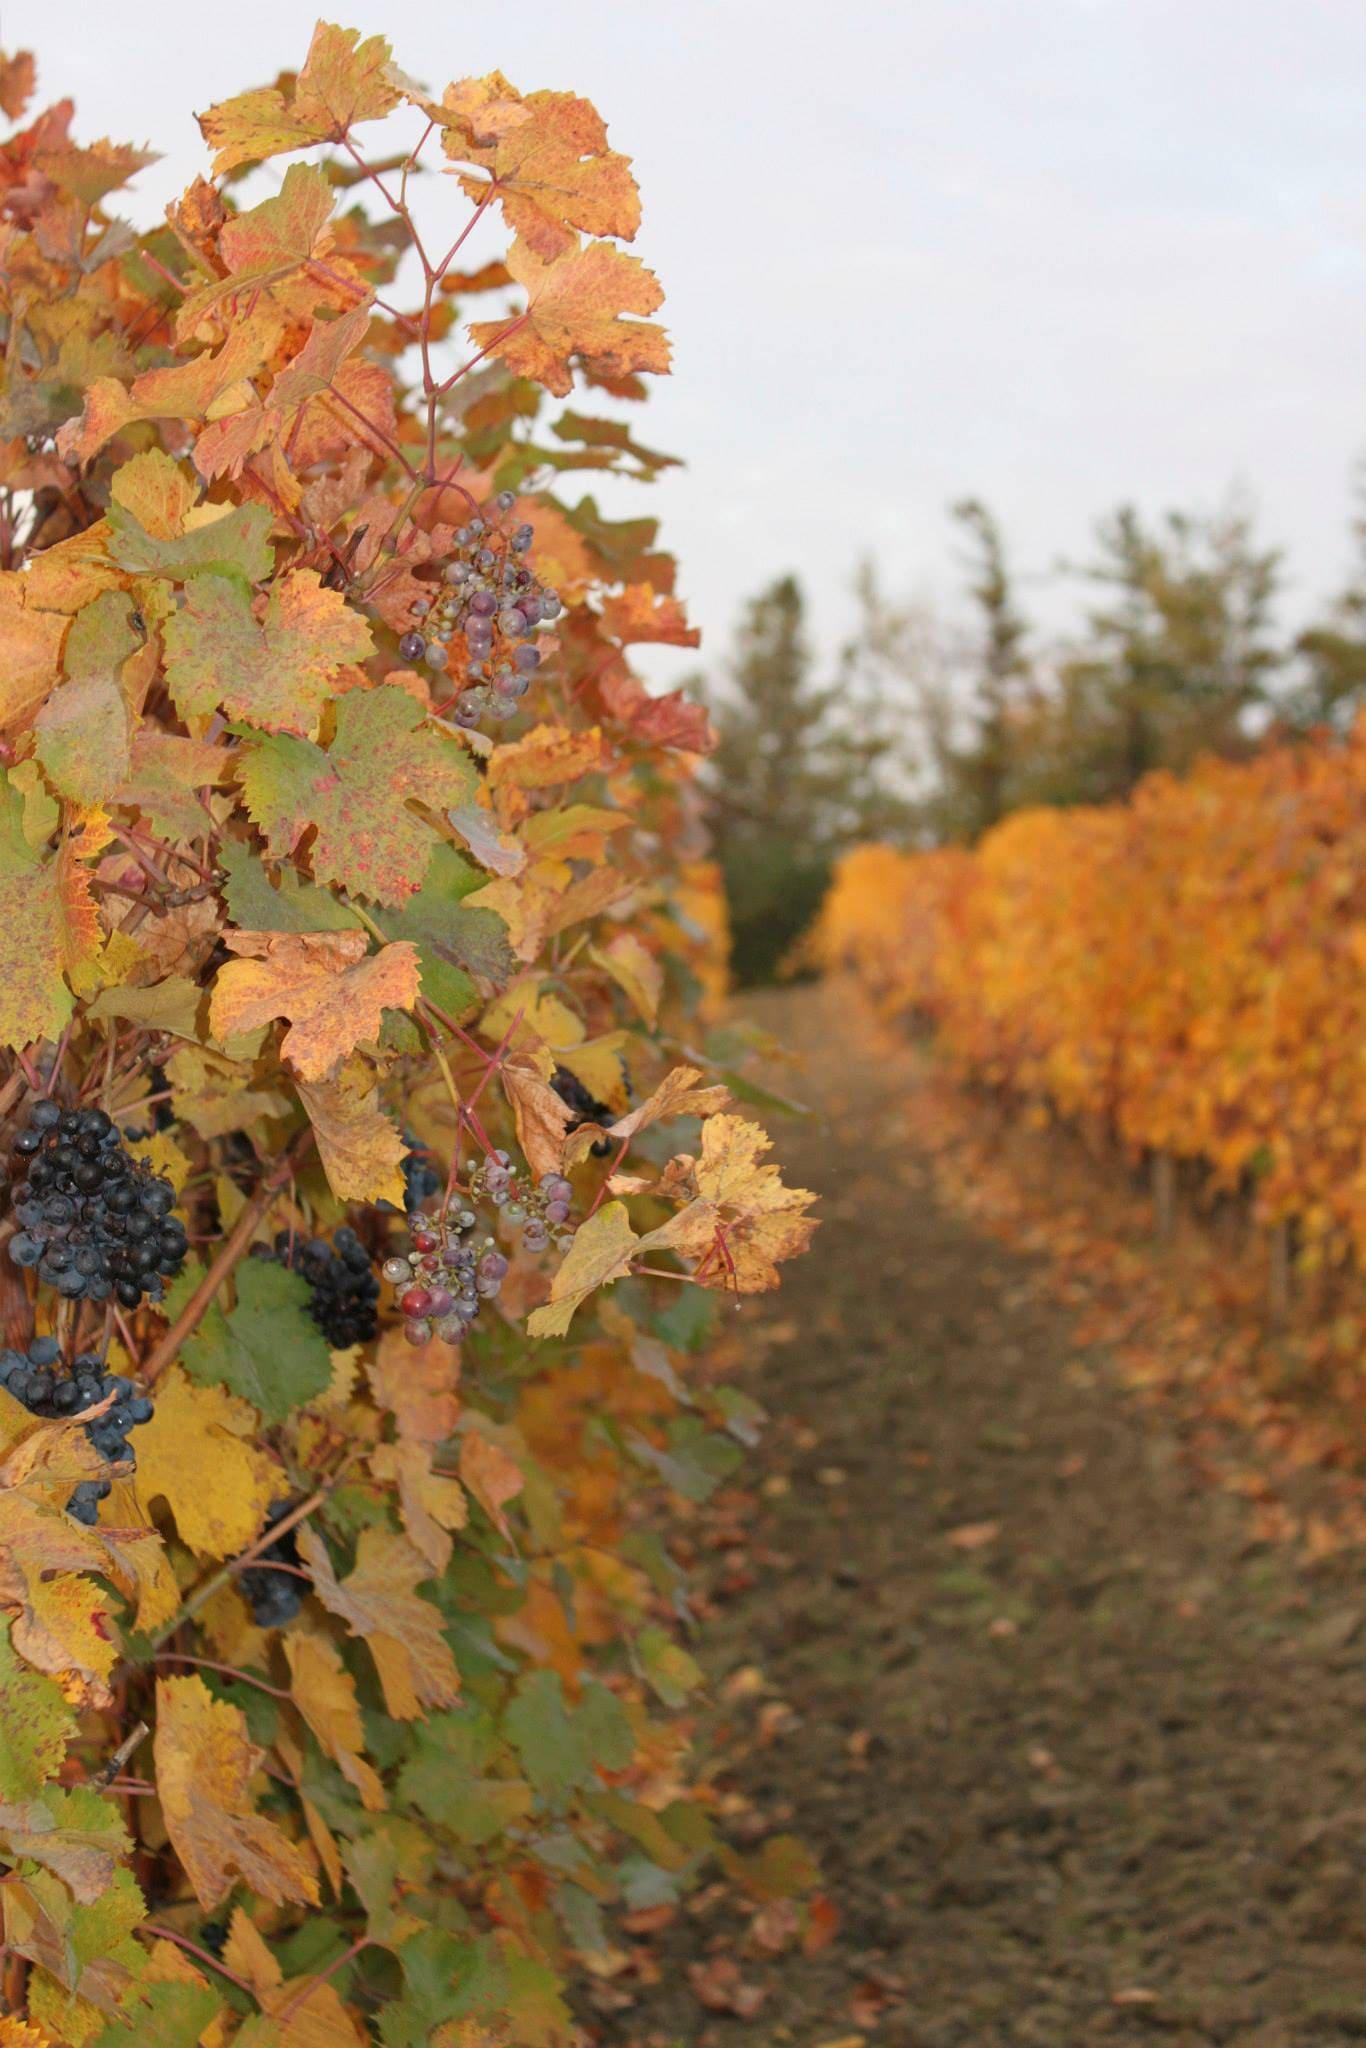 Vineyard of Poderi Colla in autumn